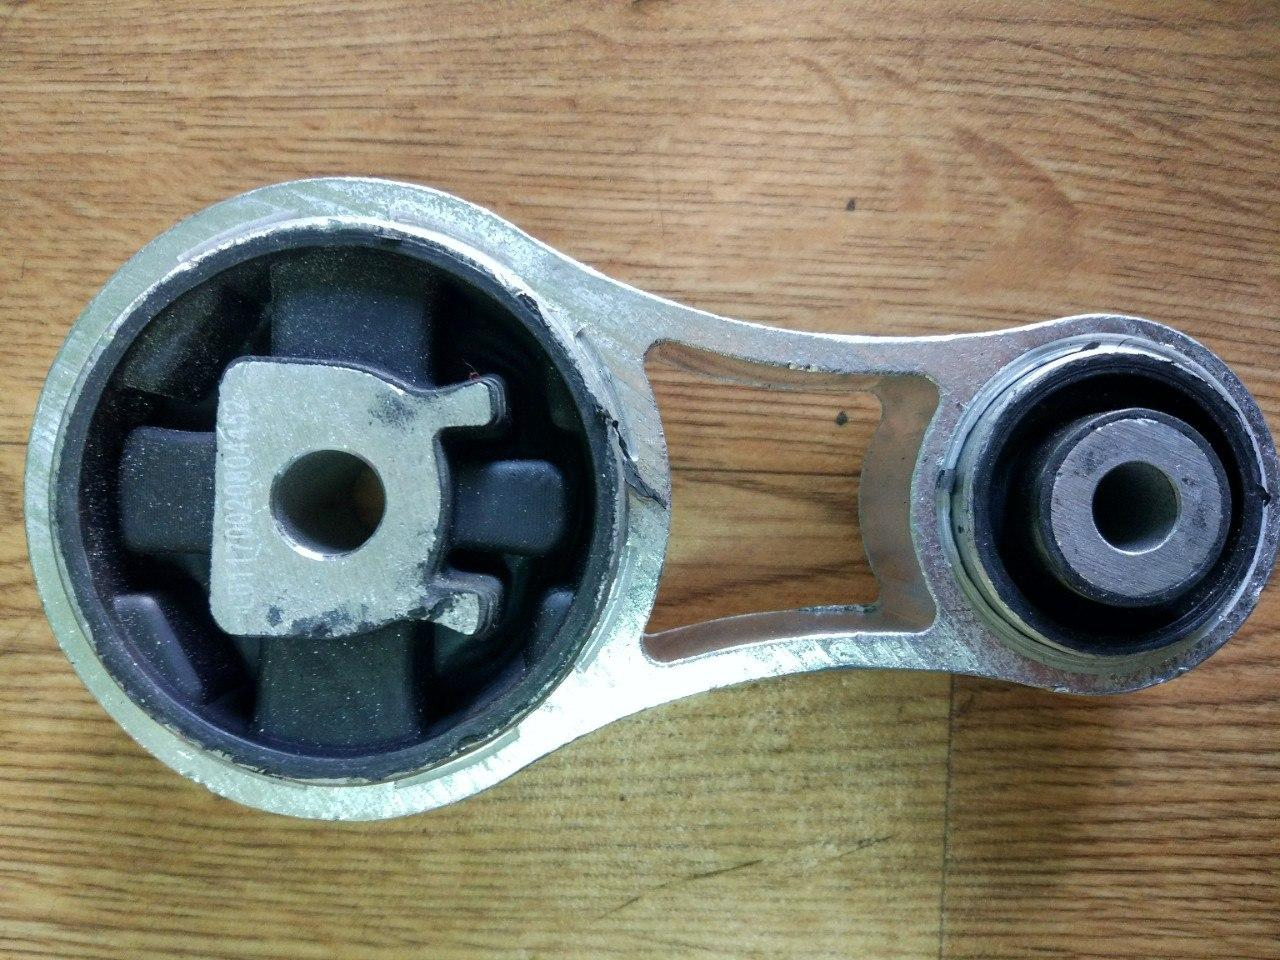 Подушка двигателя (восьмерка, нижняя) Renault Trafic, Opel Vivaro 1.9, 2001-2006, Metalcauho 04452